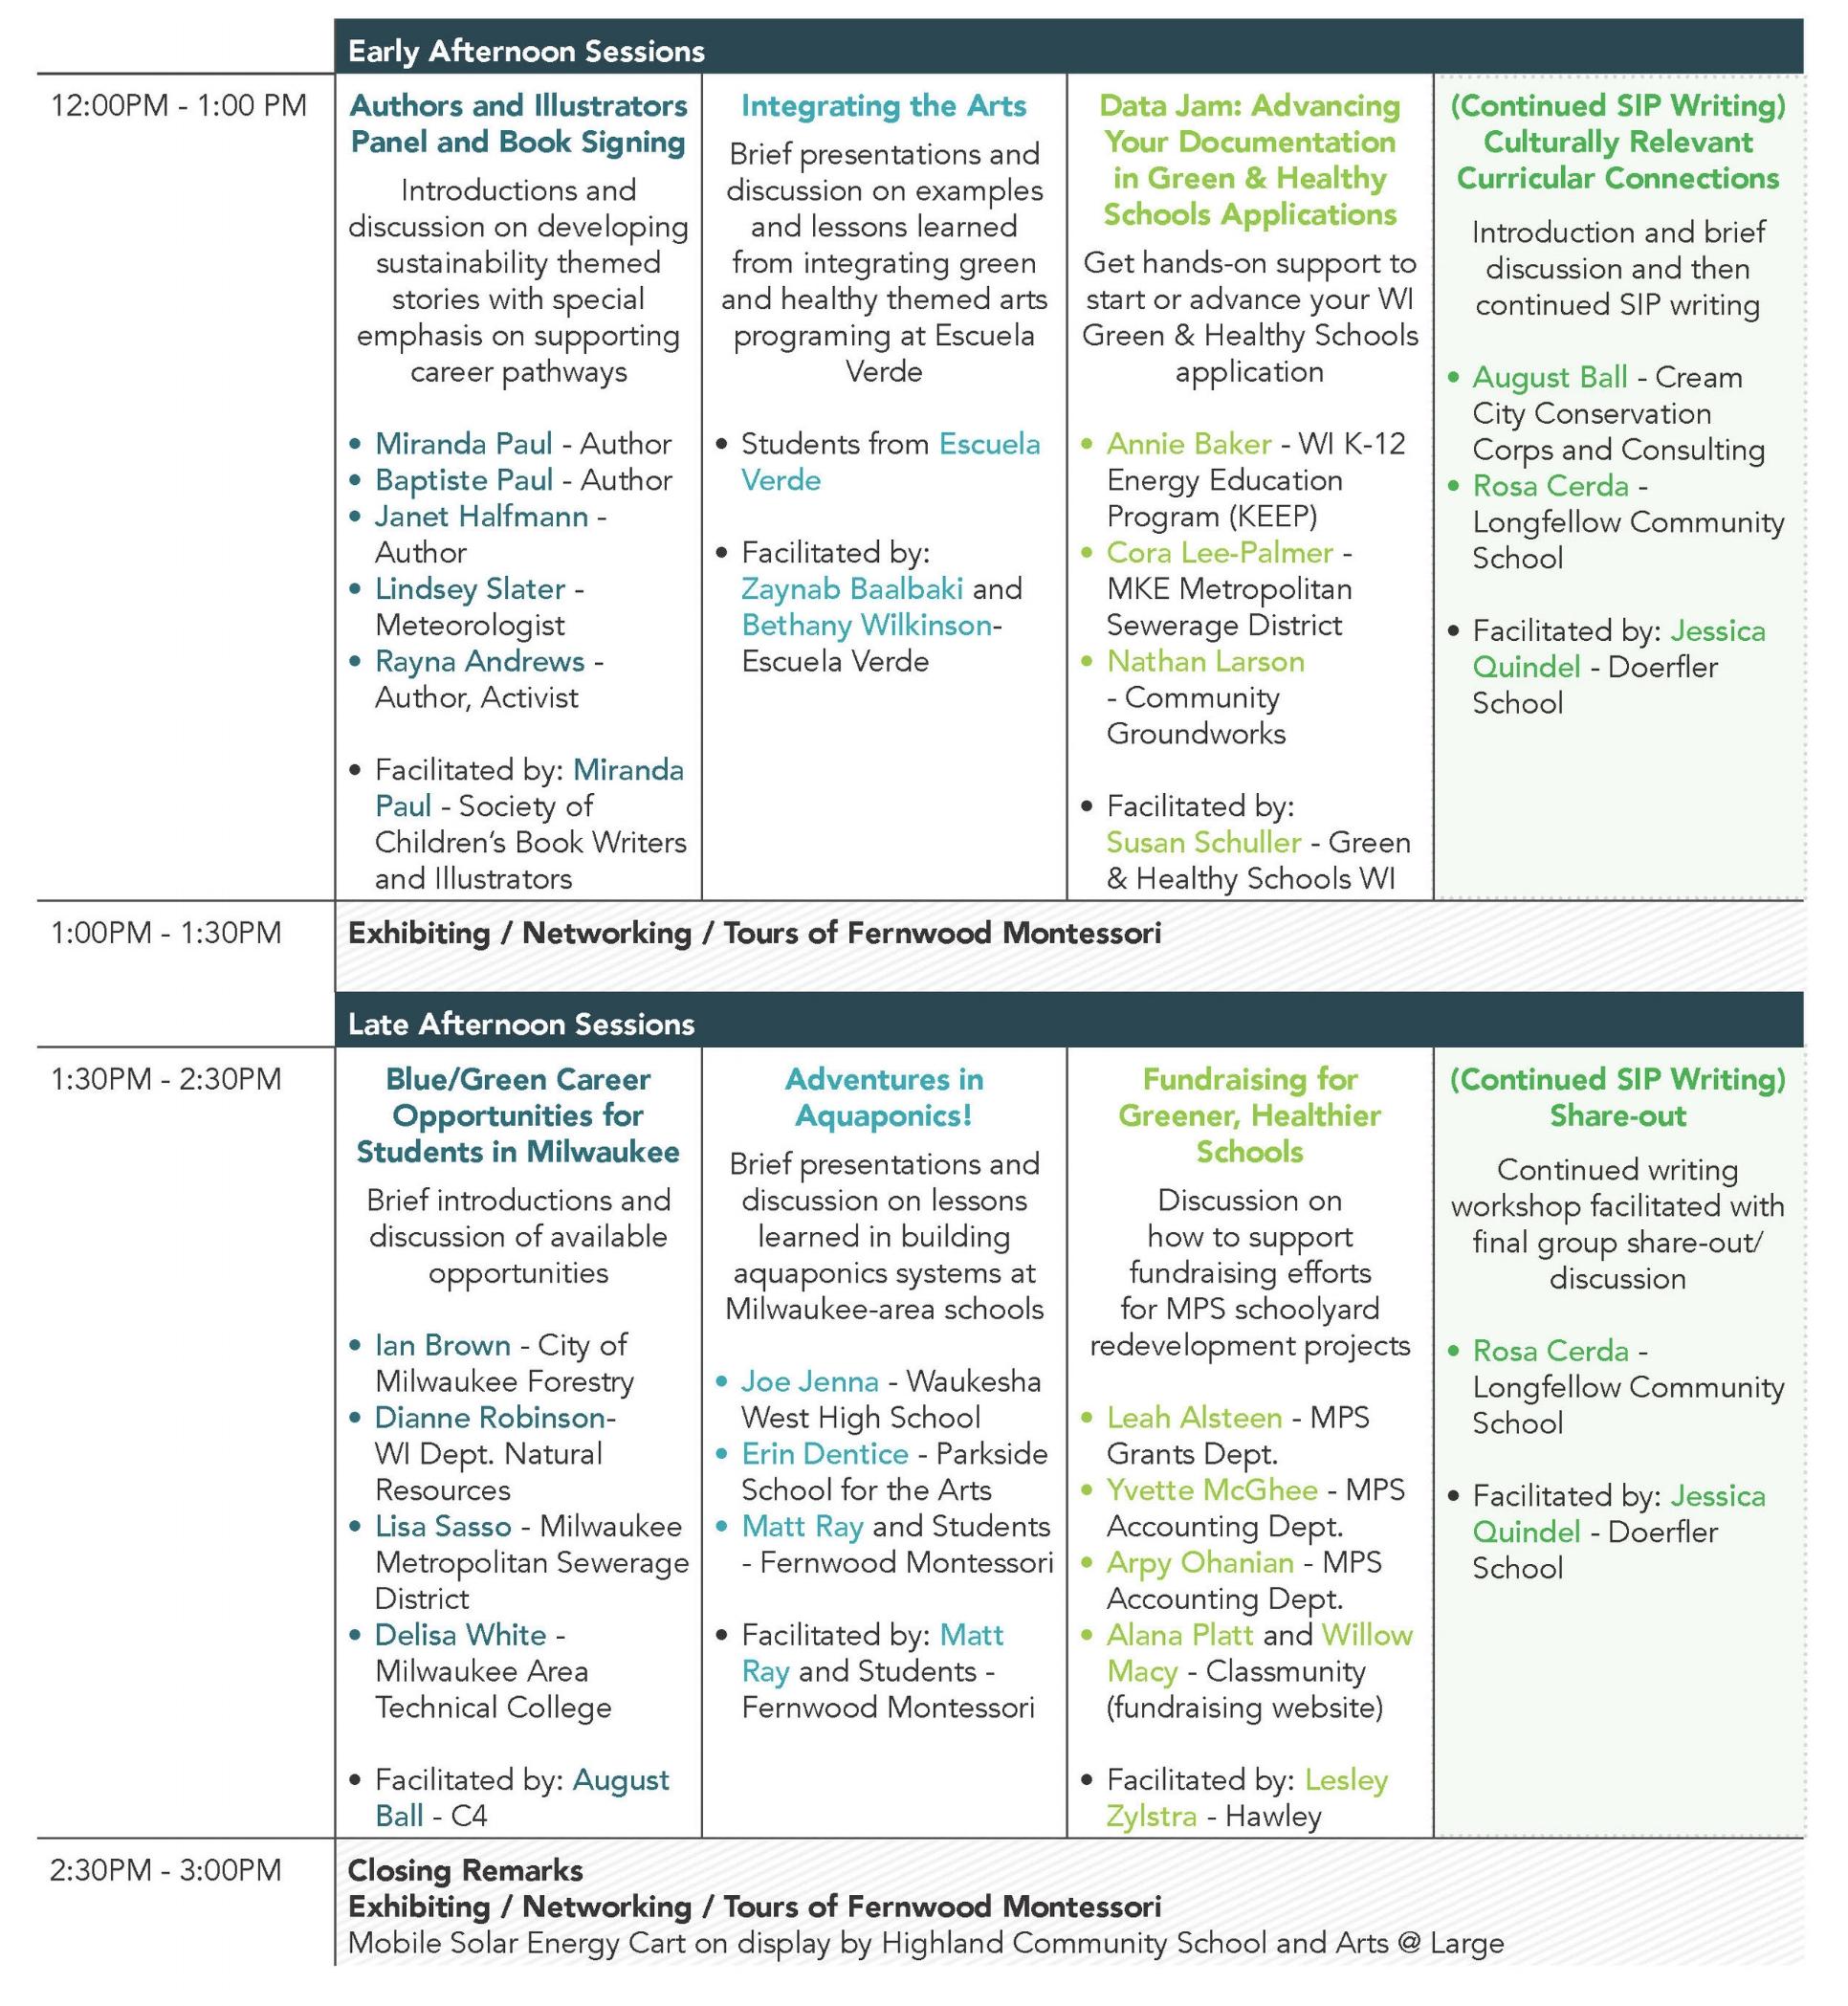 2018 Green Schools Conference Agenda_Page_2.jpg